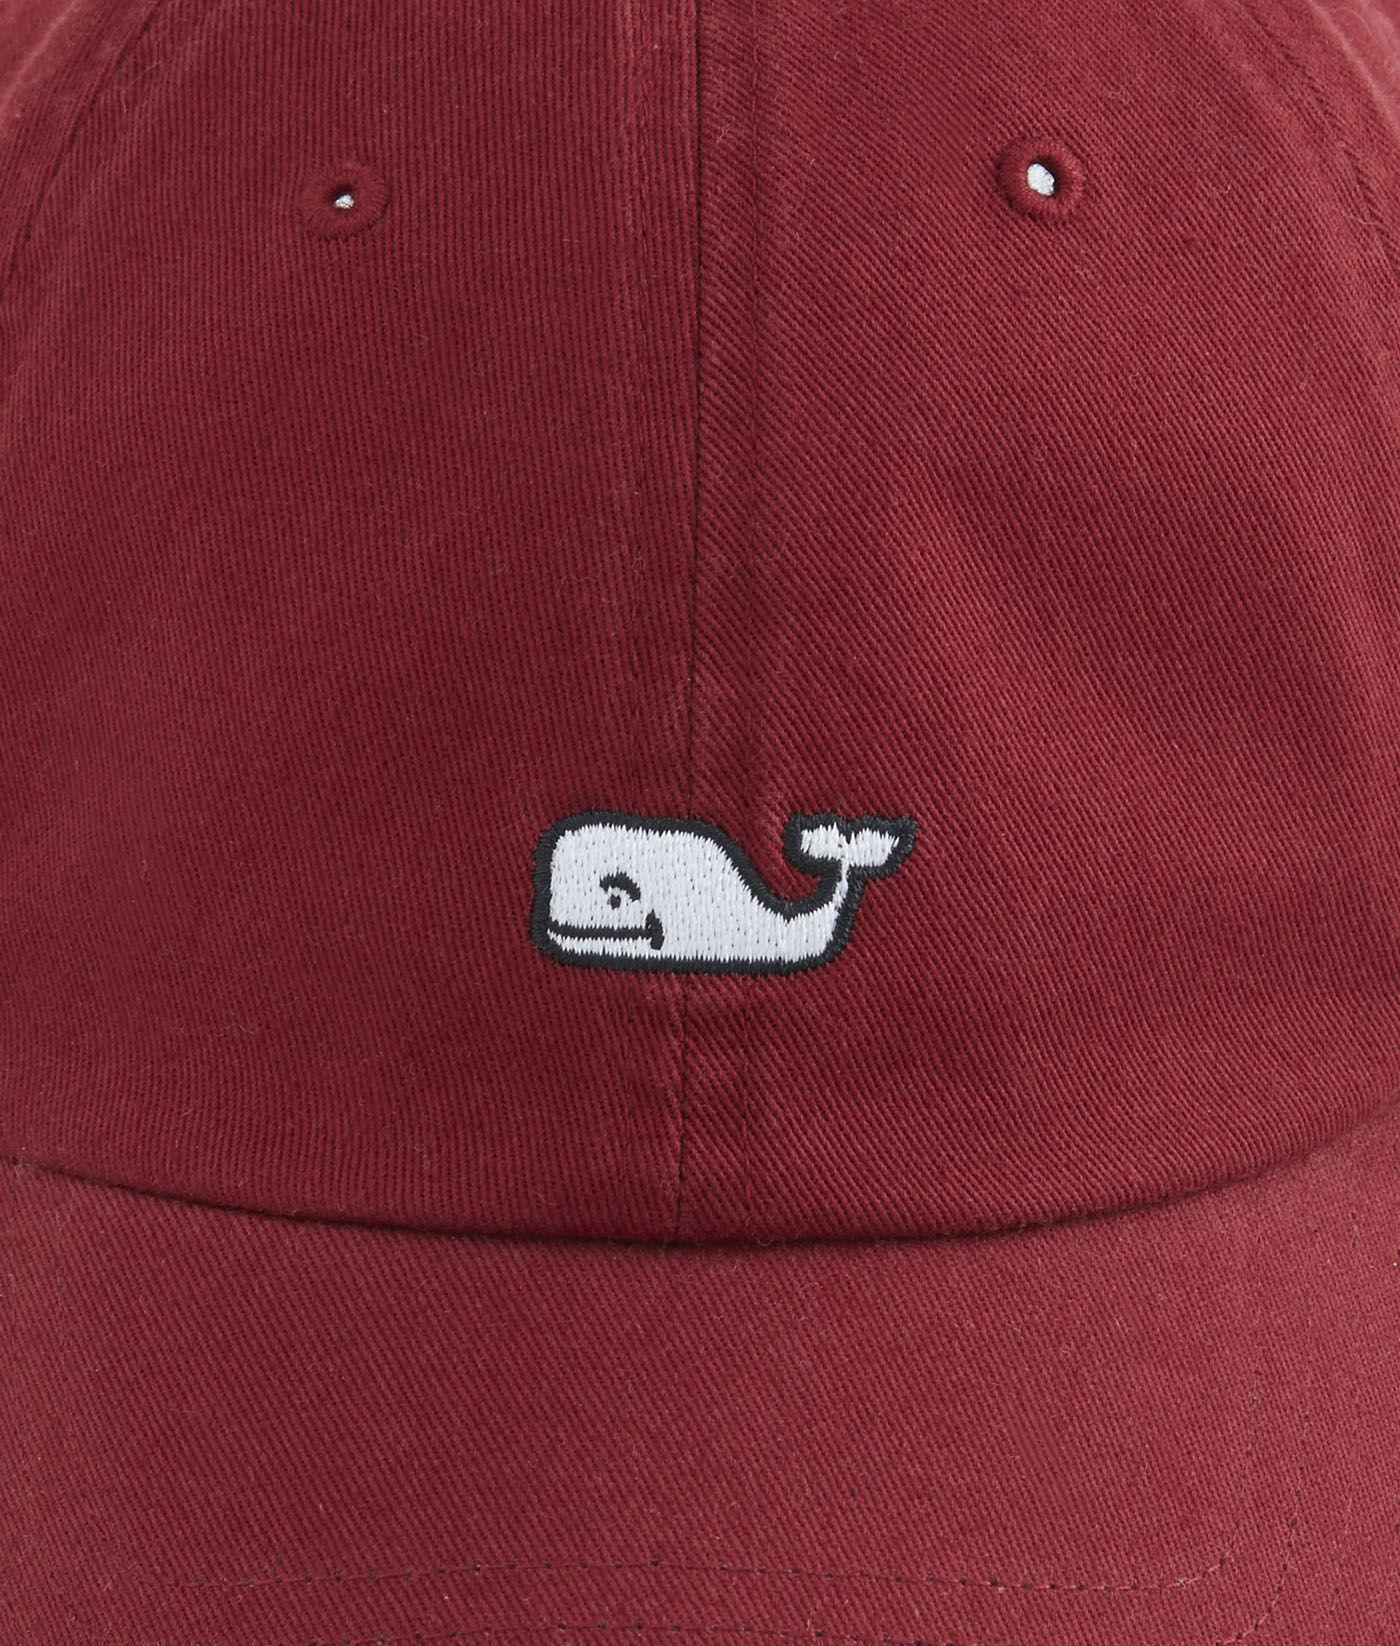 40d62cf7428 Lyst - Vineyard Vines Collegiate Baseball Hat in Red for Men